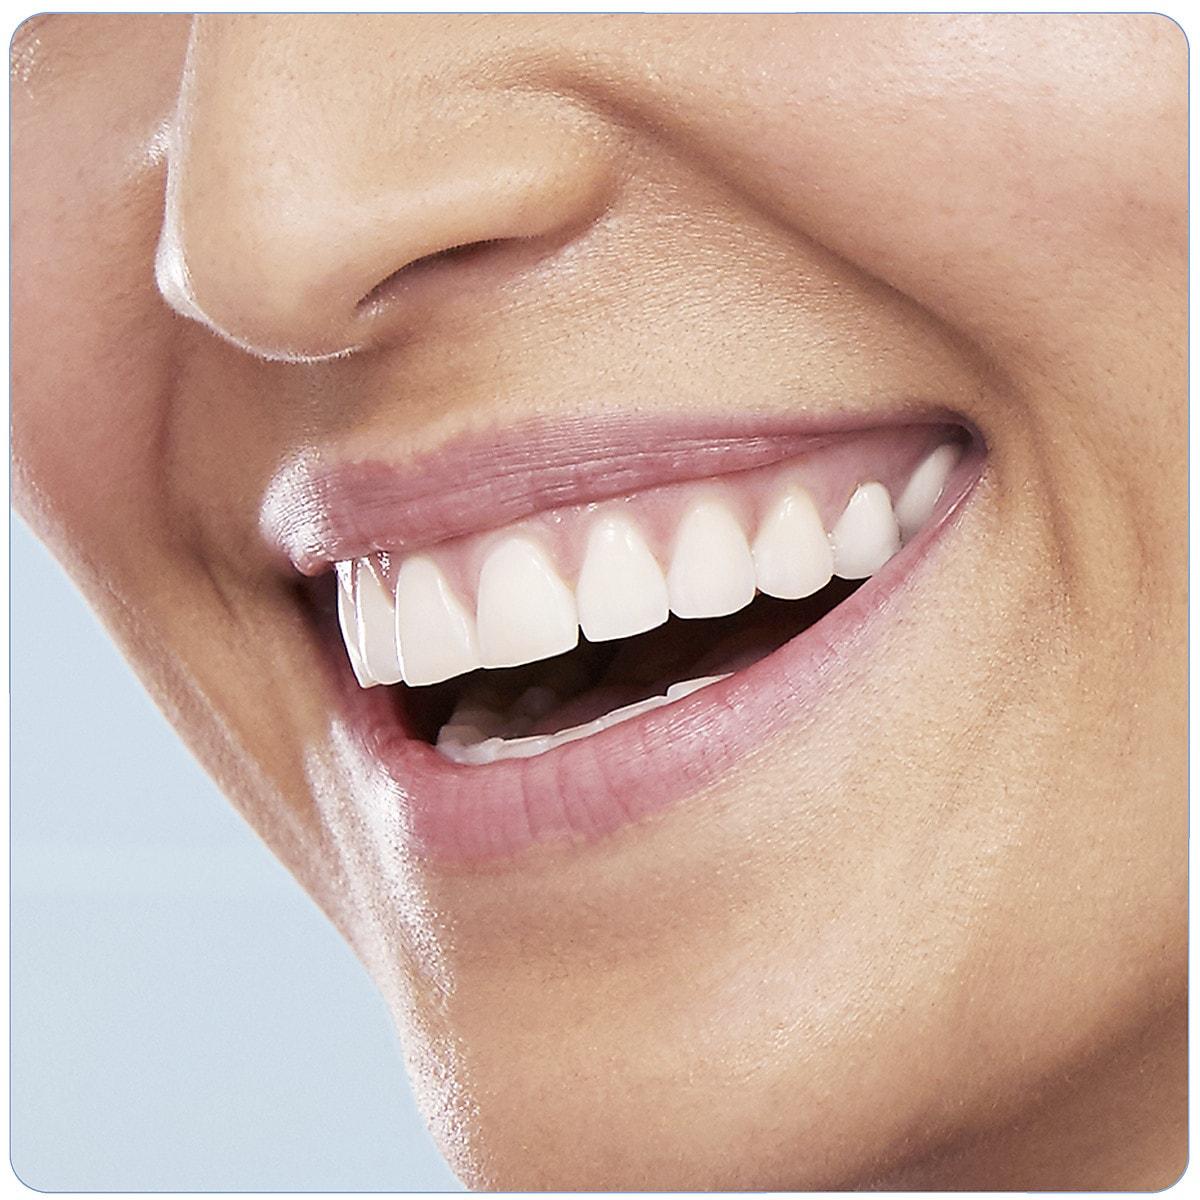 Oral-B PRO 670 Cross Action tannbørste